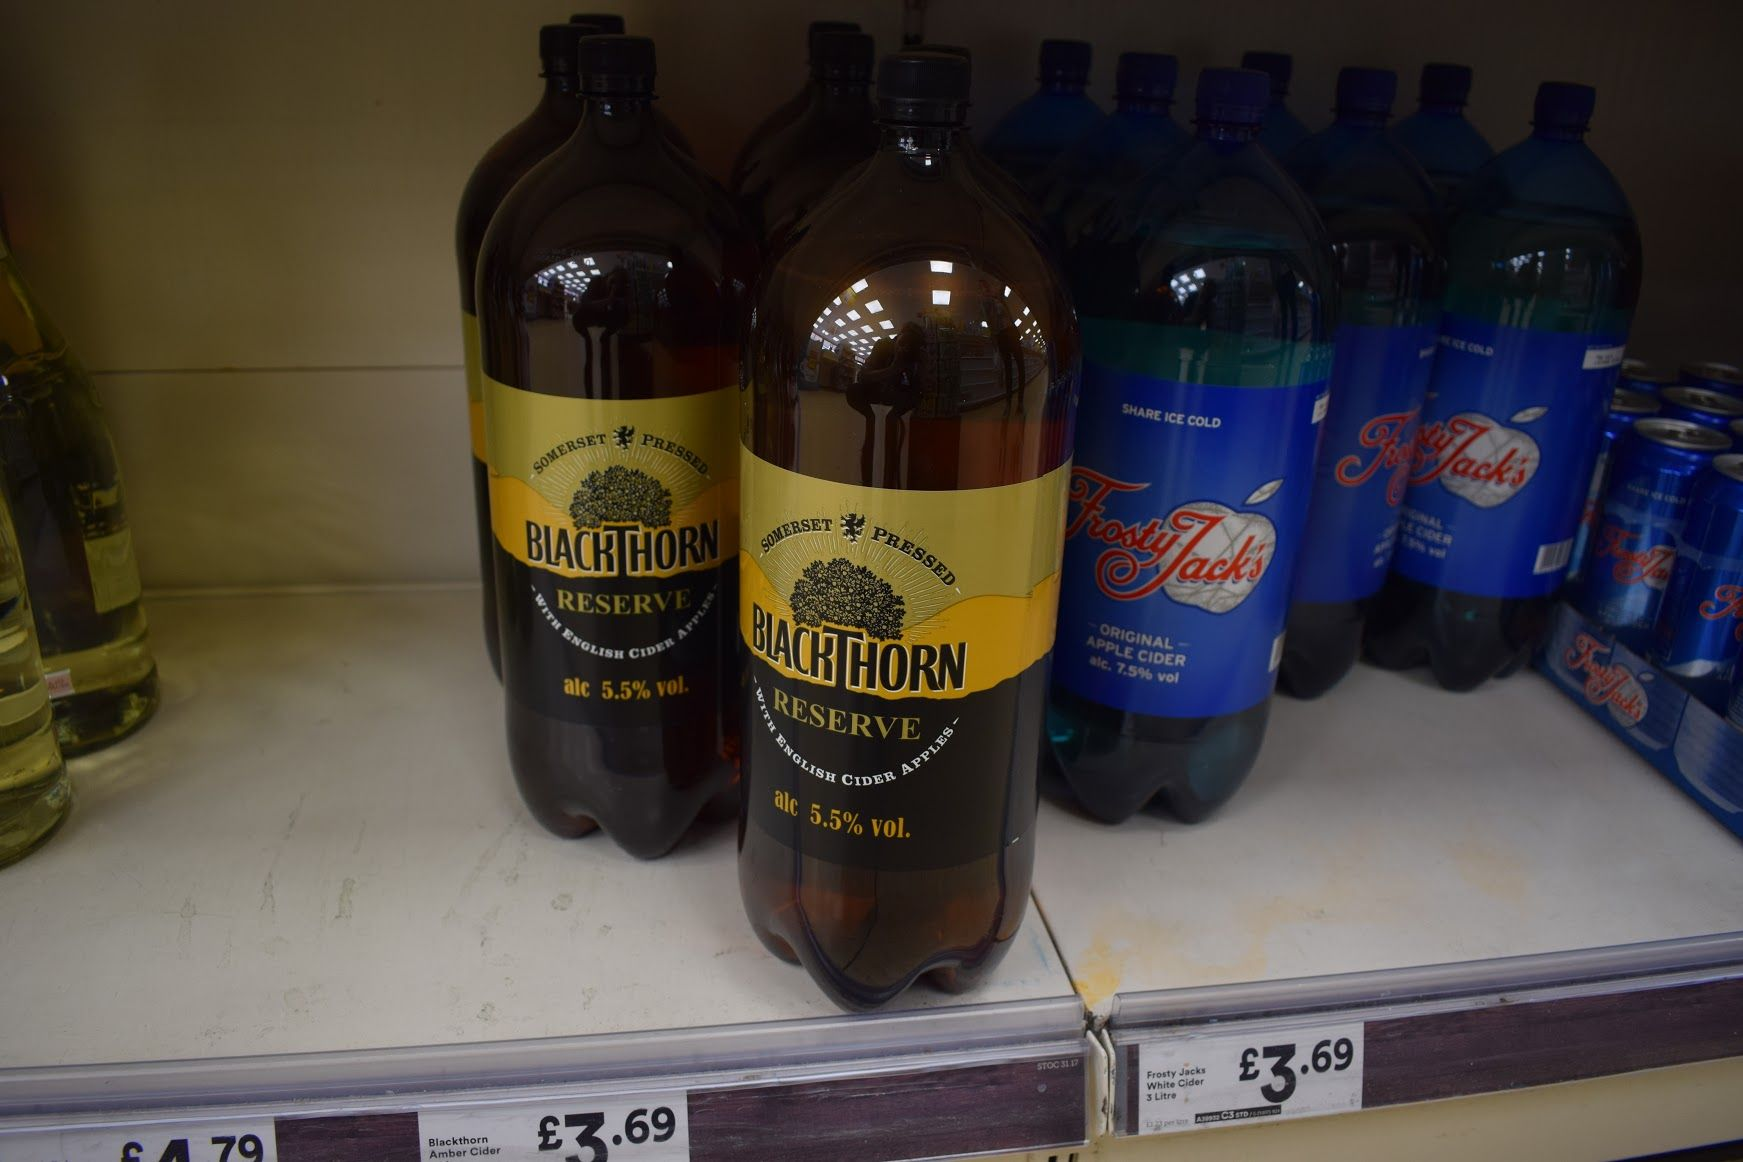 Image may contain: Drink, Bottle, Beverage, Beer Bottle, Beer, Alcohol